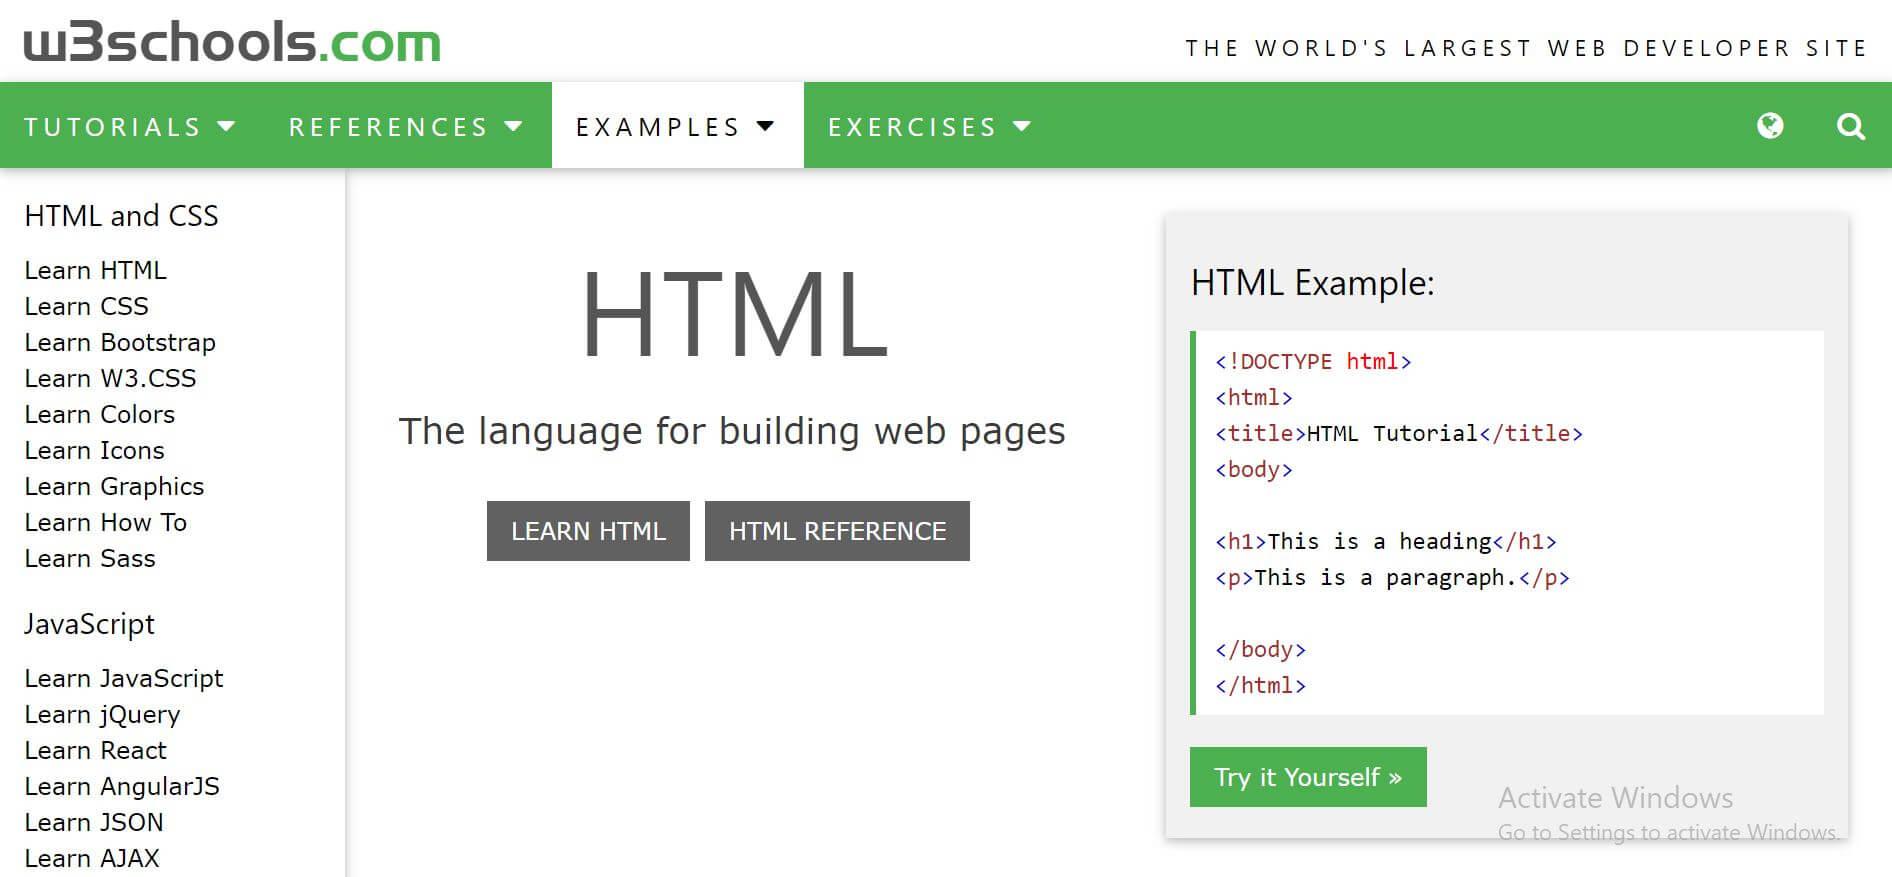 8-website-hoc-lap-trinh-web-cuc-bo-ich-6